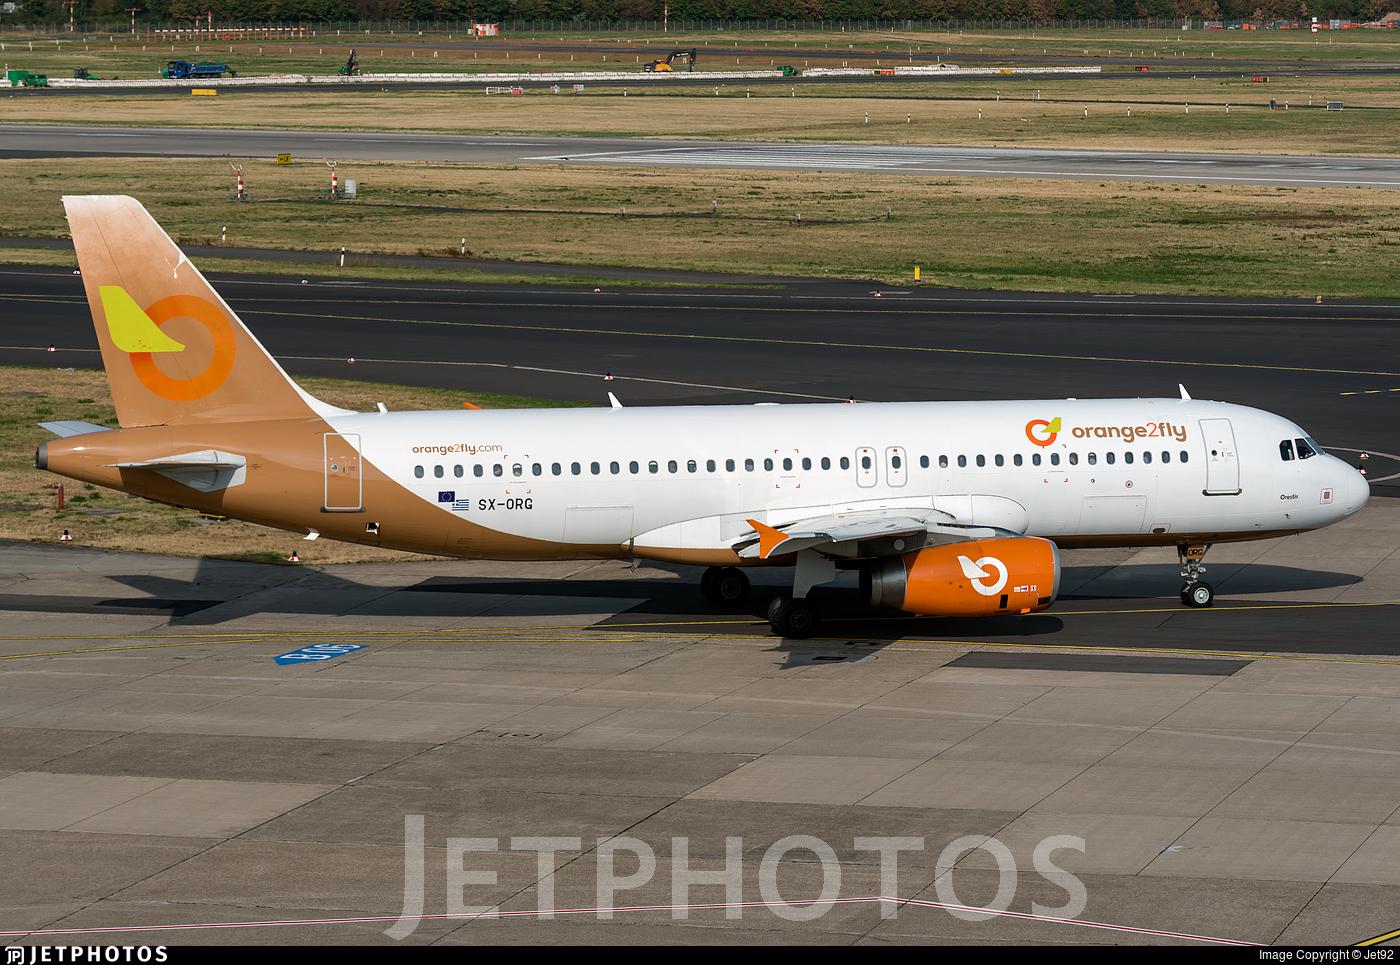 SX-ORG | Airbus A320-232 | Orange2Fly | Jet92 | JetPhotos